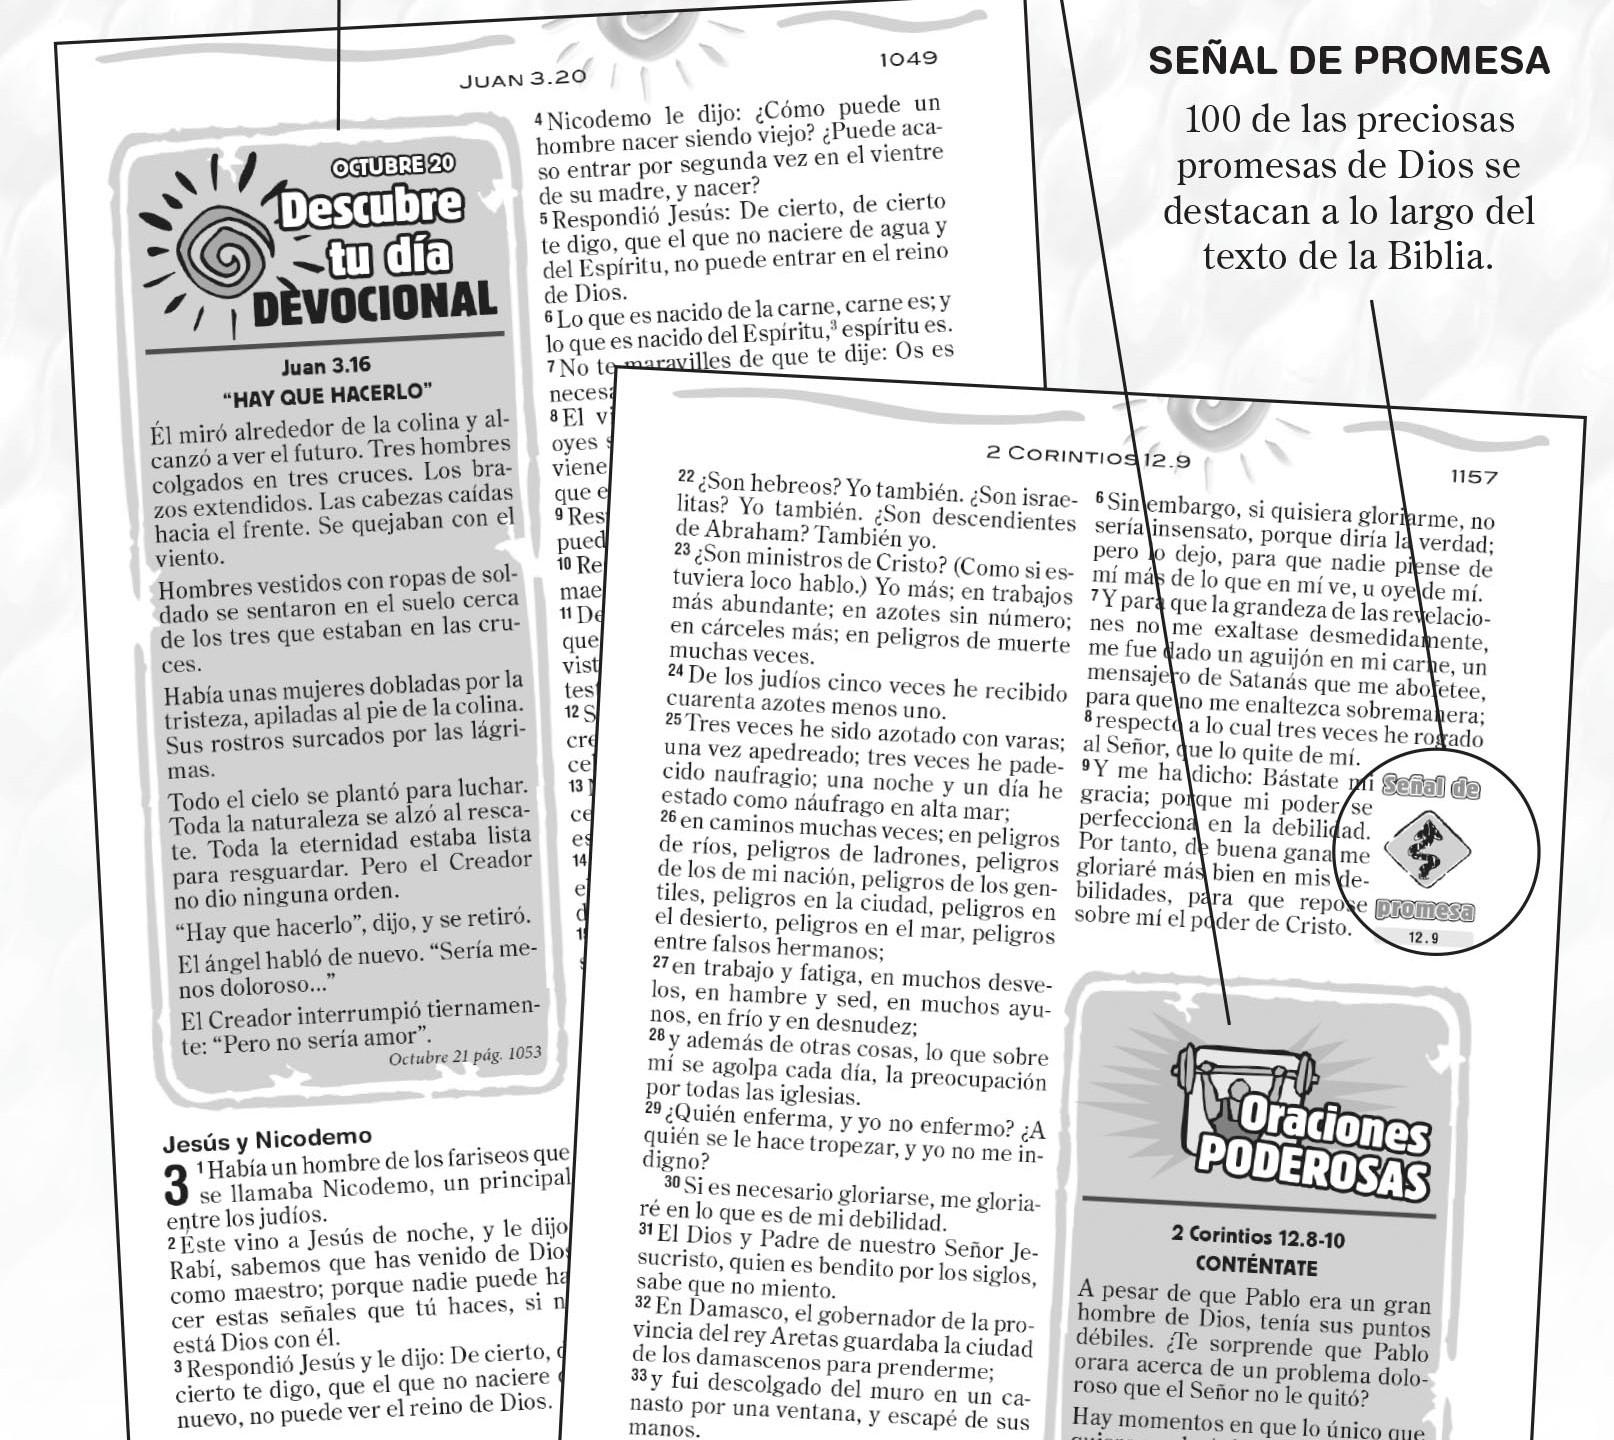 Pages from 00-Intr-Devocional-RVR1960-2